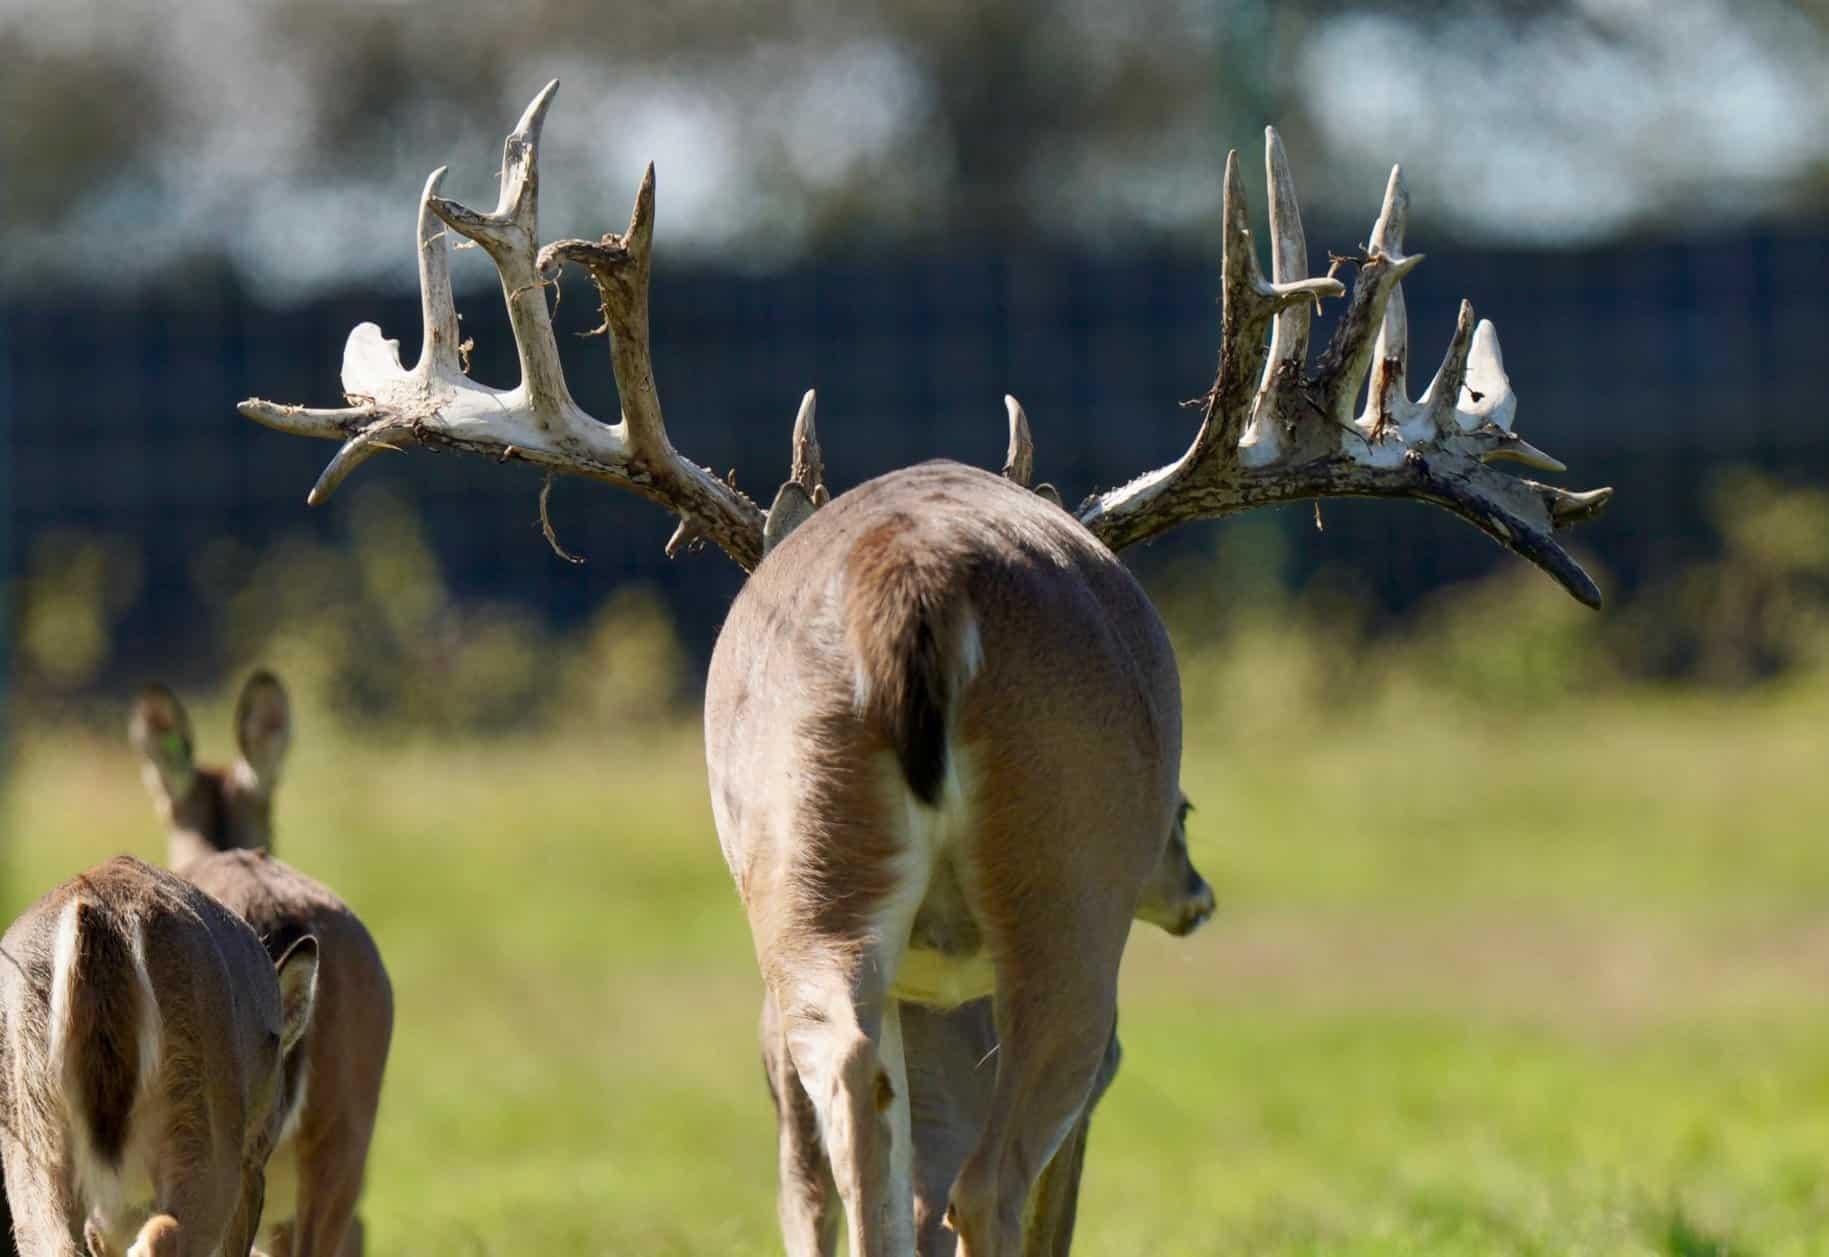 Breeder bucks on our Texas deer breeders farm